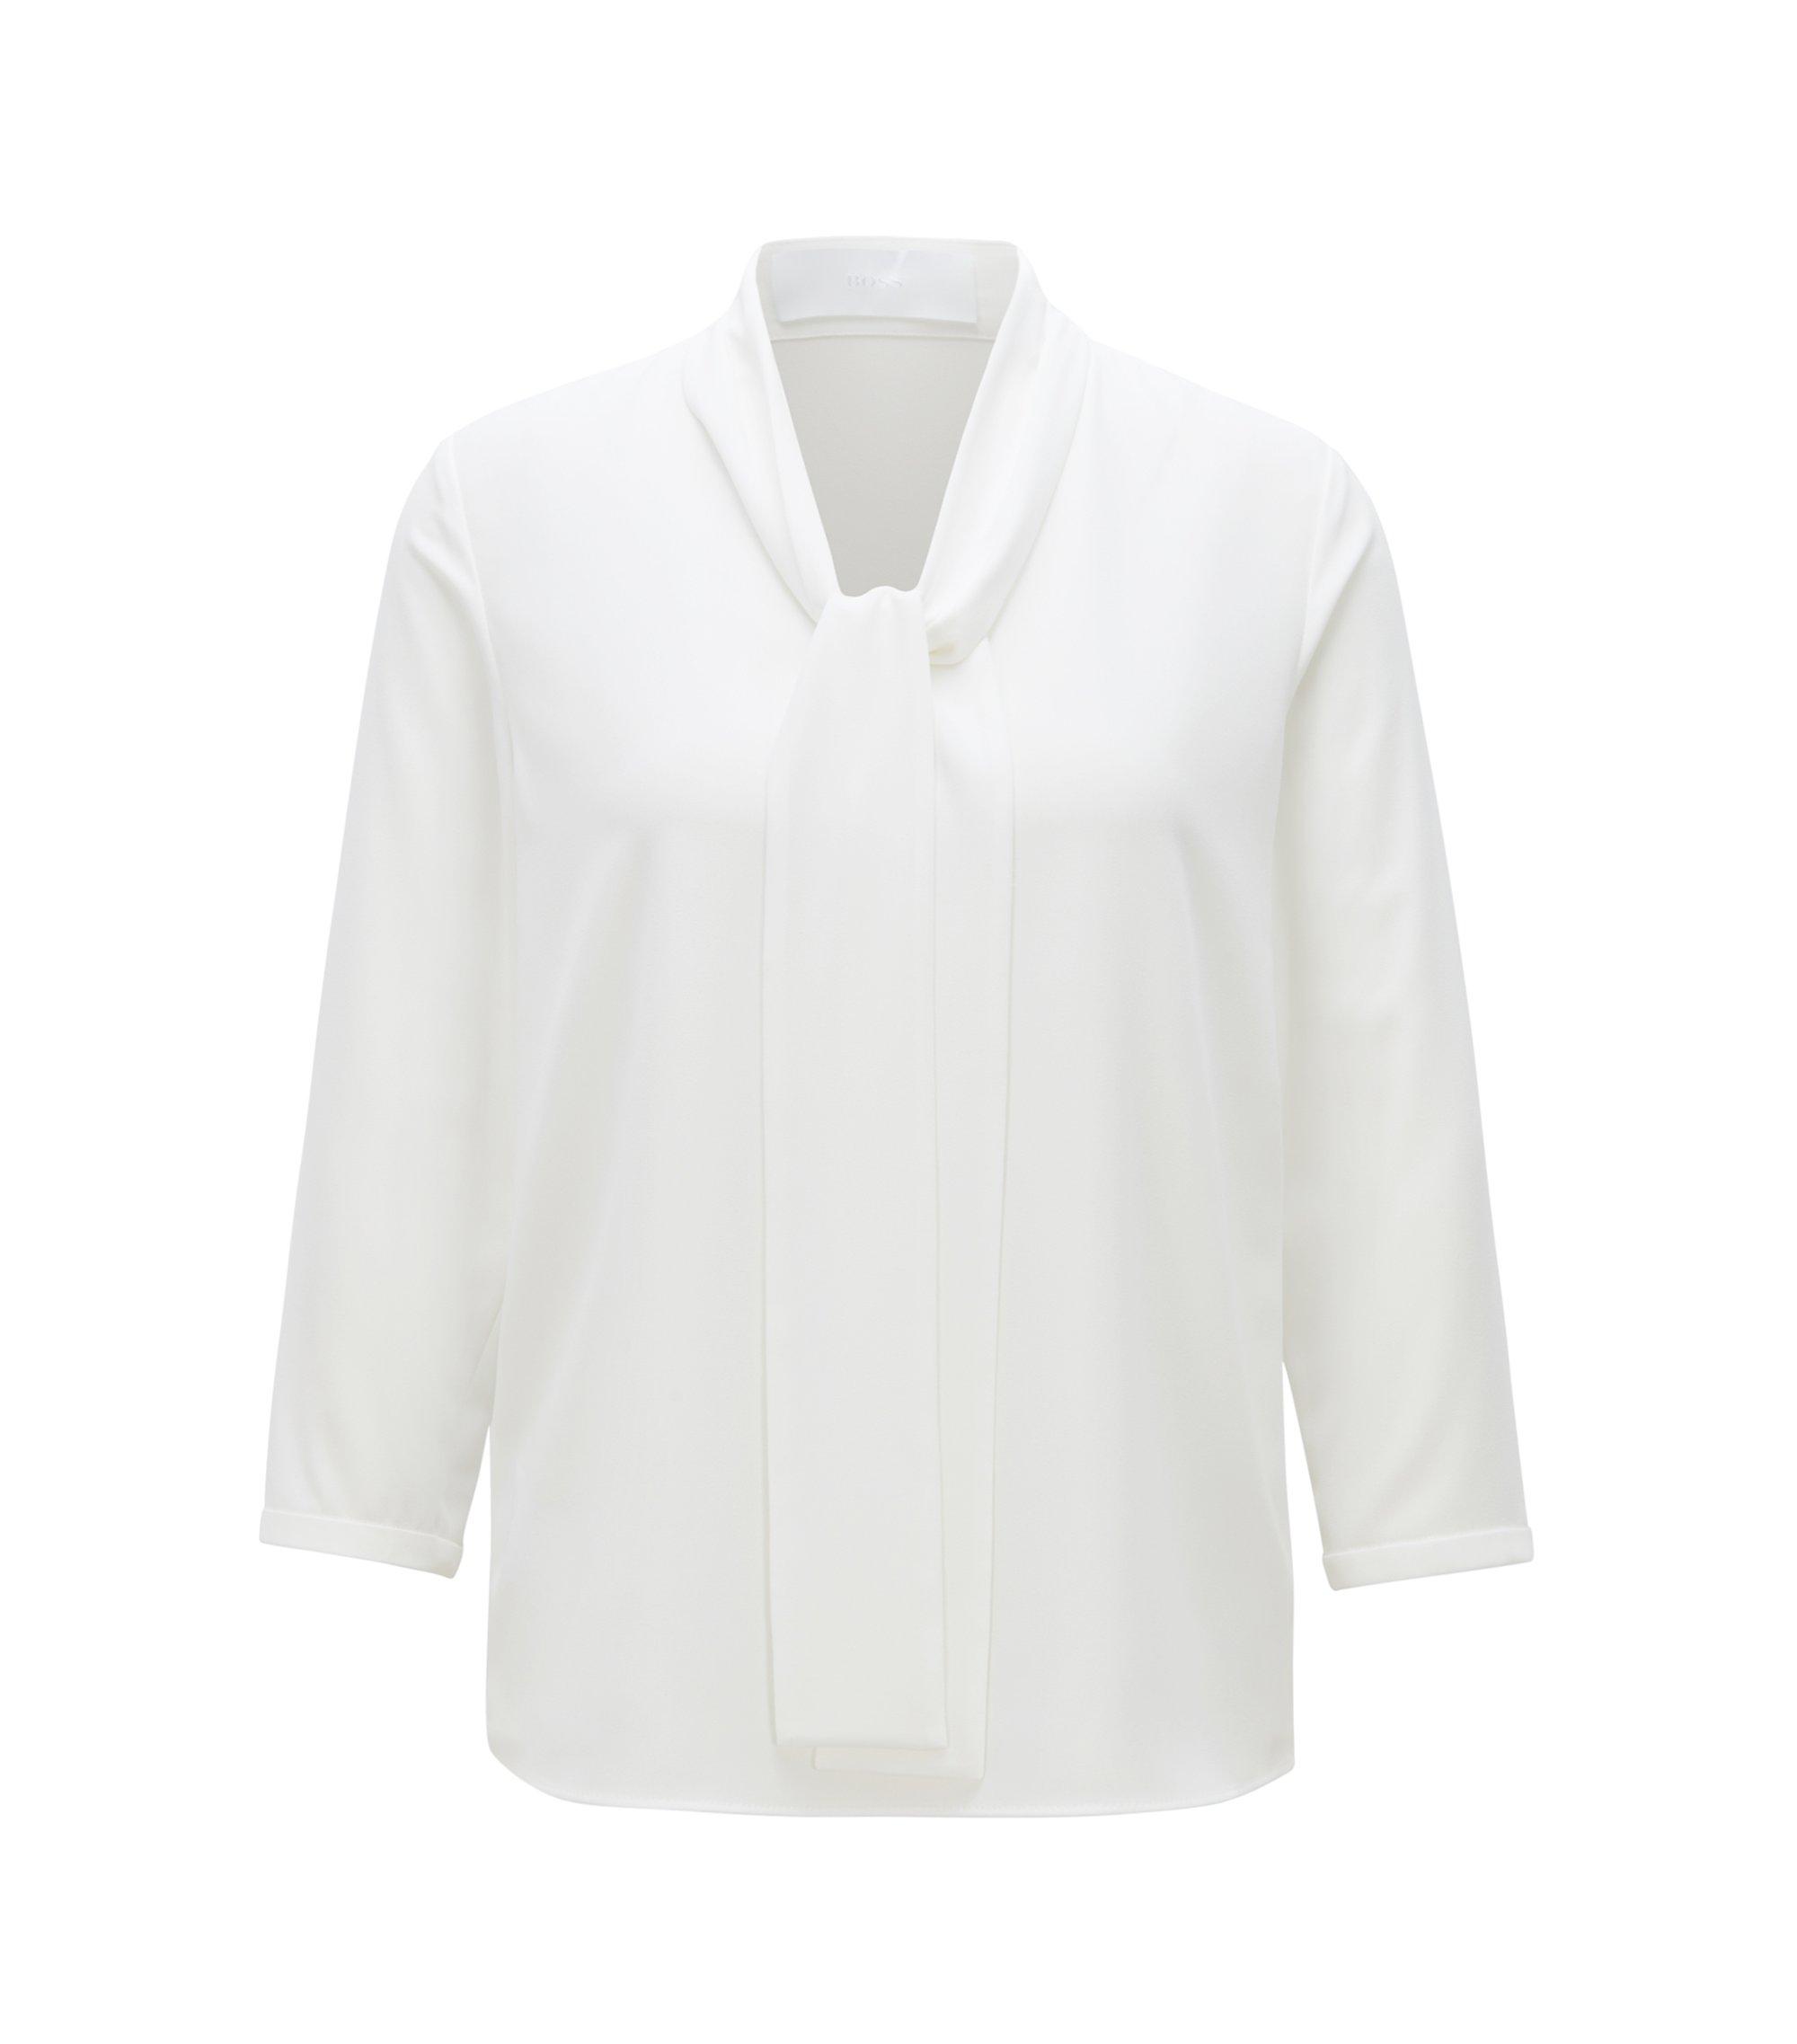 Lichte blouse van stretchcrêpe met strikkraag, Naturel